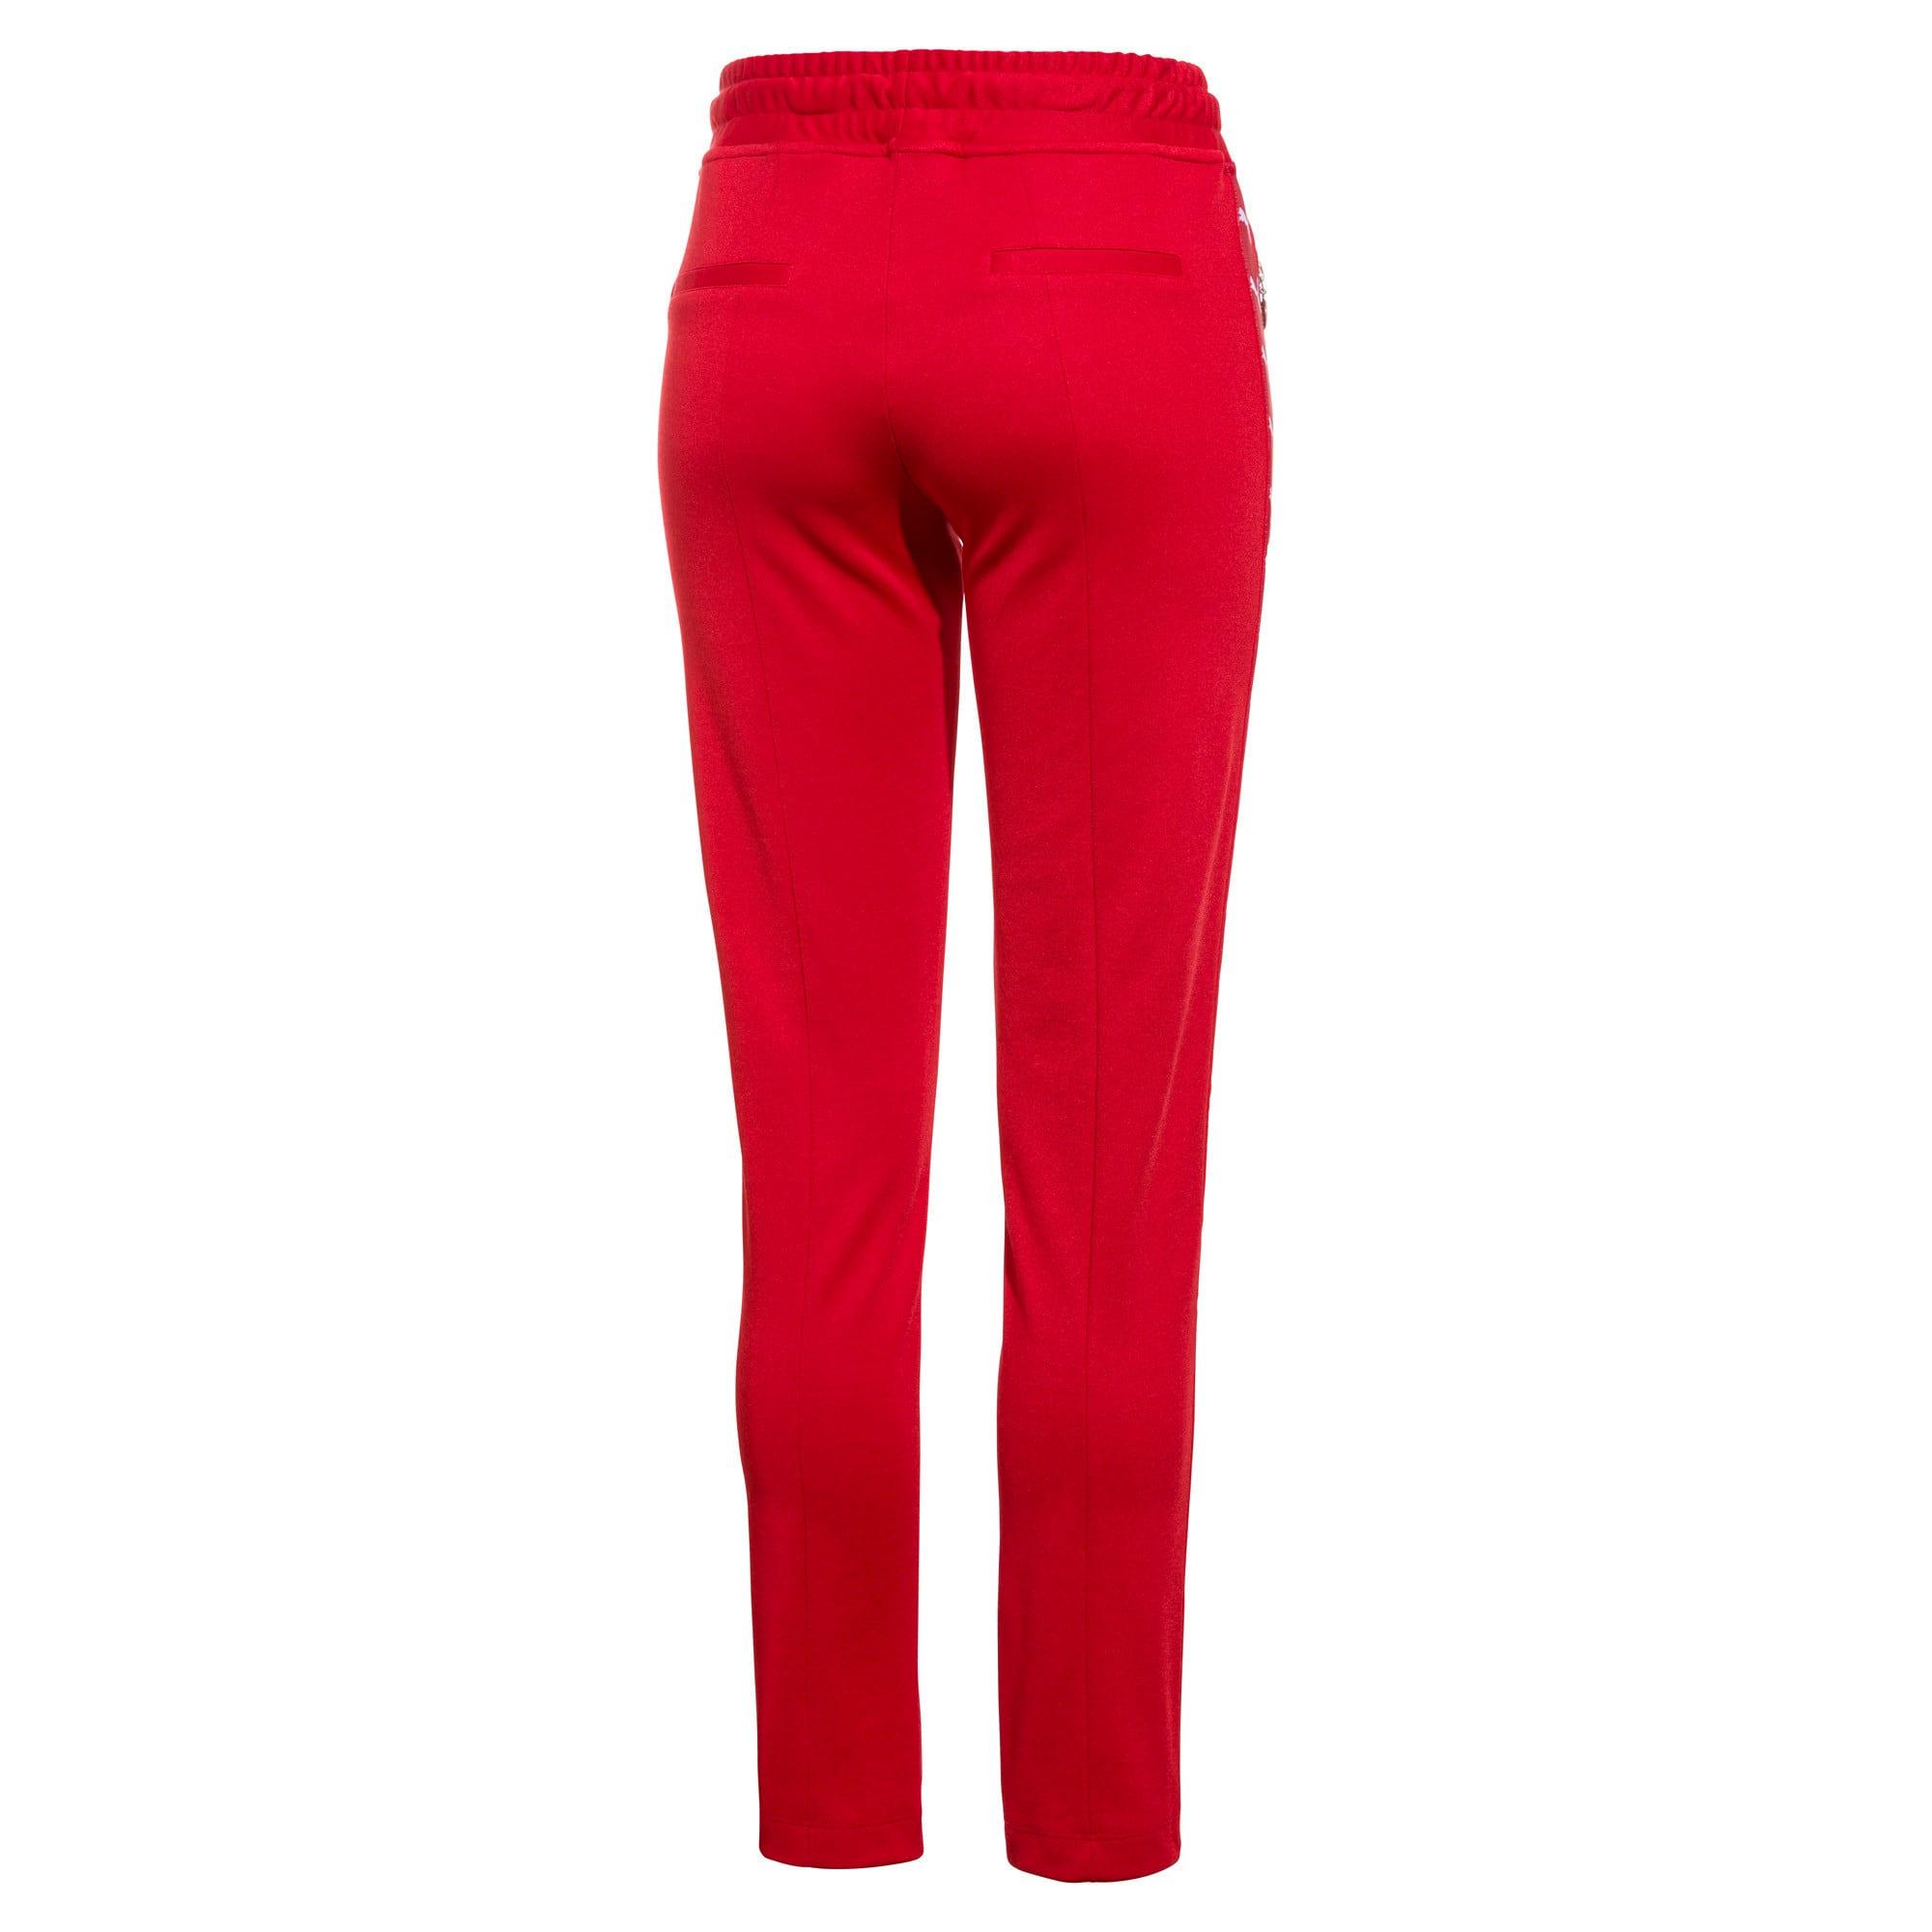 Thumbnail 2 of PUMA x THE KOOPLES Women's Track Pants, High Risk Red, medium